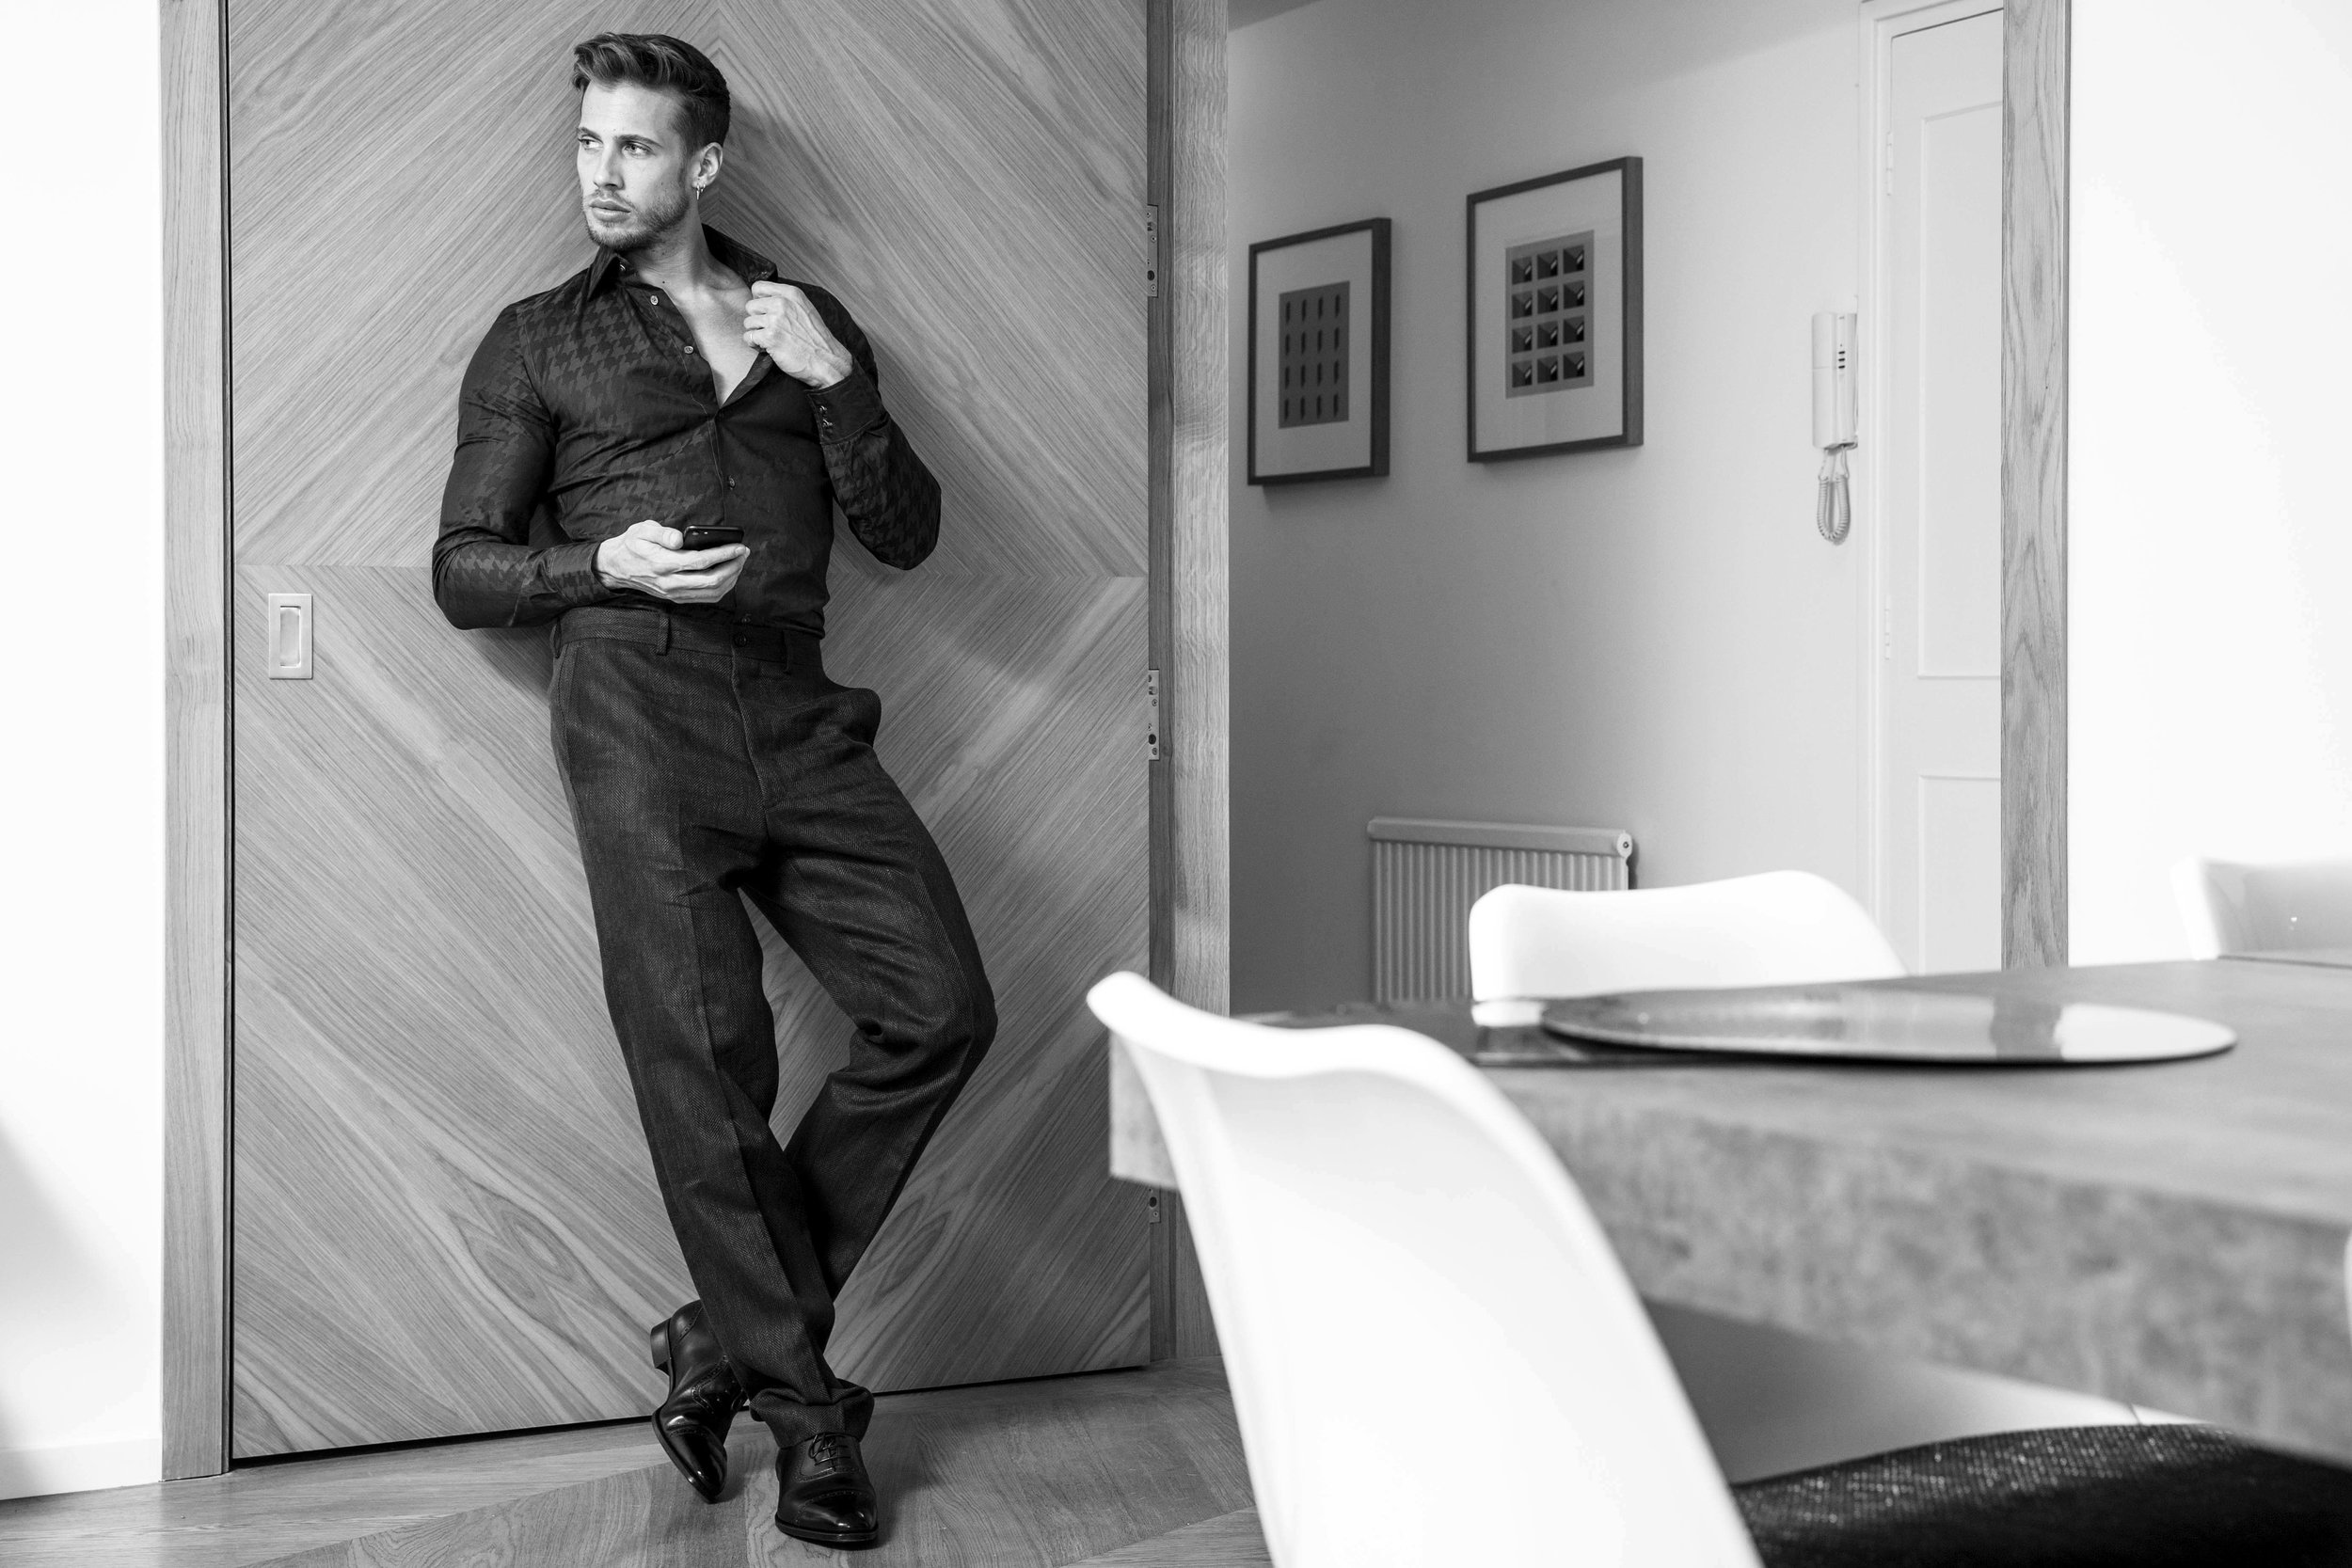 Suit -  Tiger of Sweden , Shirt -  Richard James , Shoes -  Gaziano & Girling